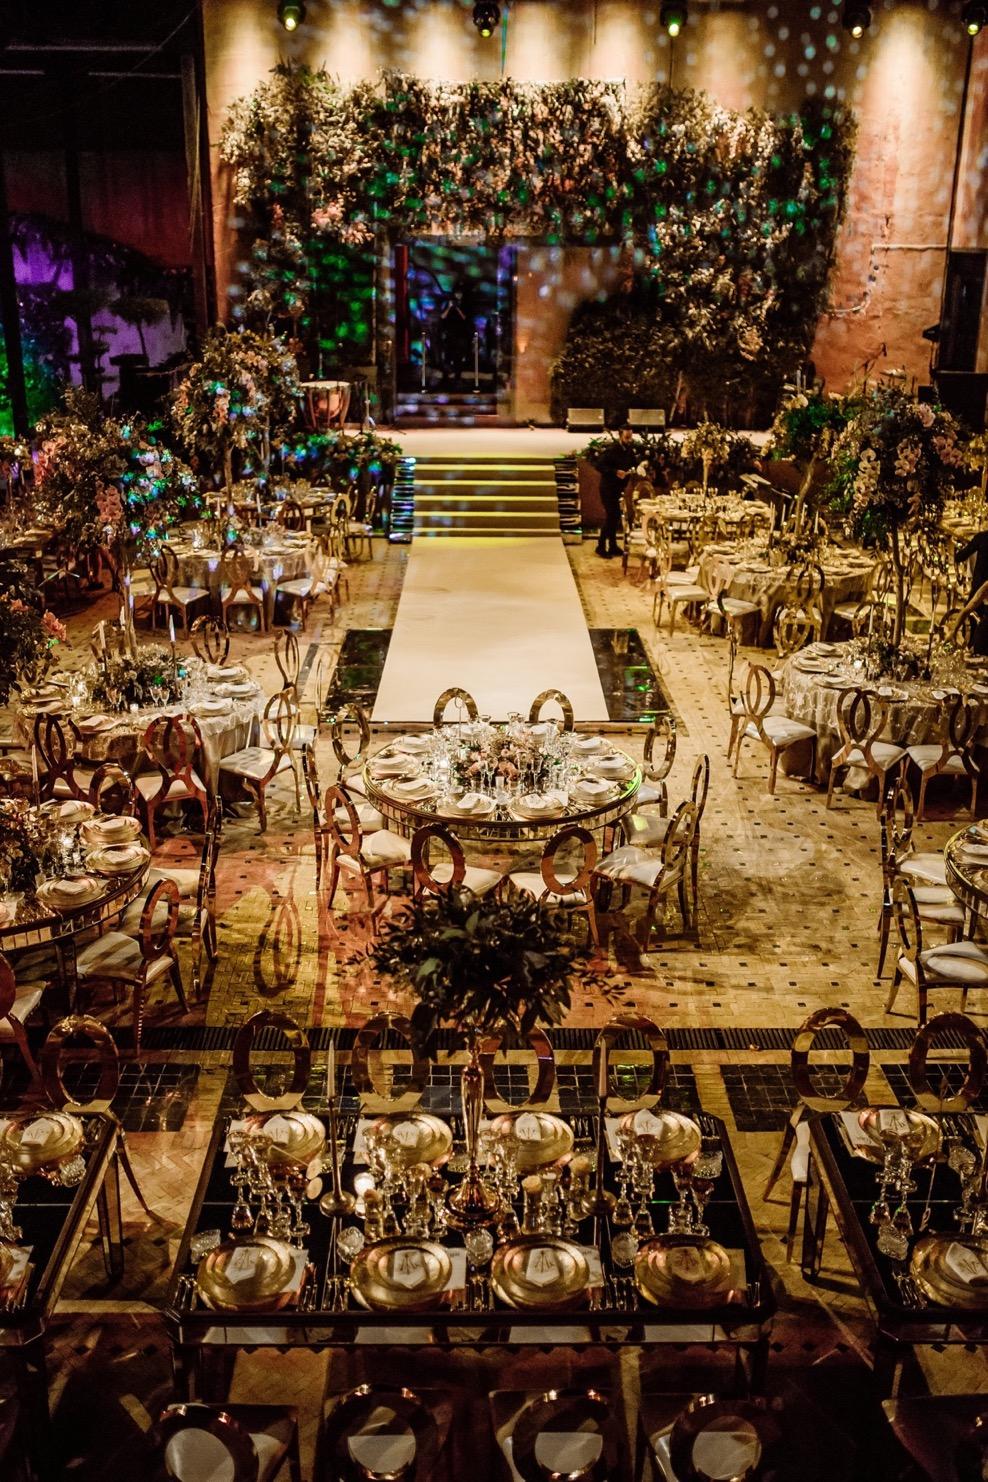 Si-Quiero-Wedding-Planner-By-Sira-Antequera-Bodas-Málaga-Marbella-Miami- L-A-20